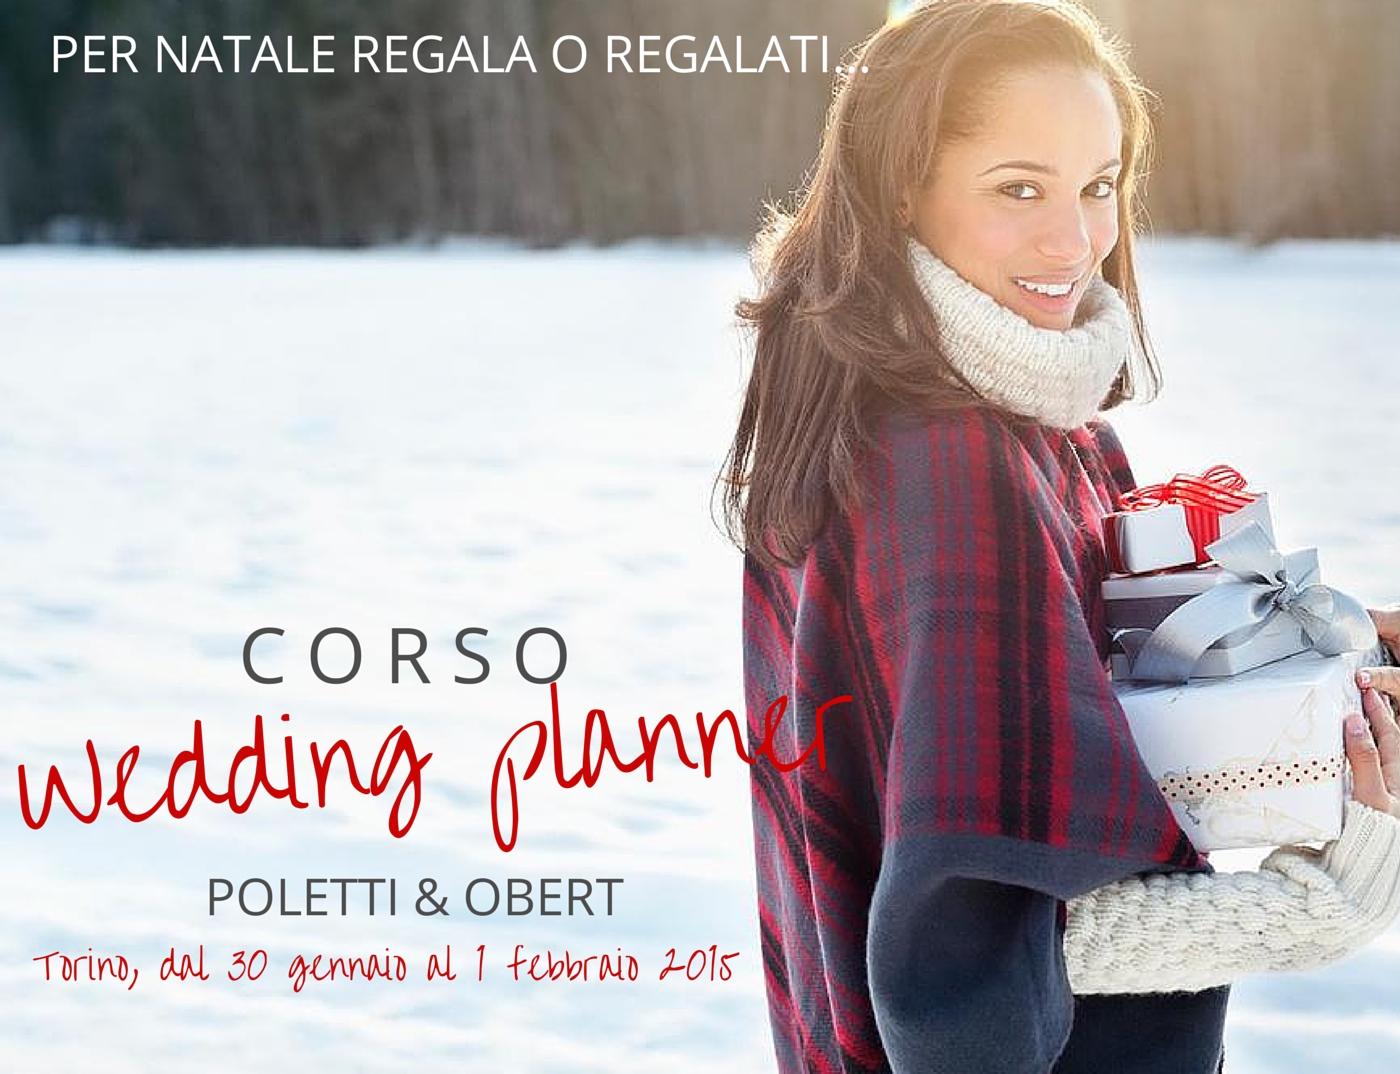 Corso wedding planner (4)